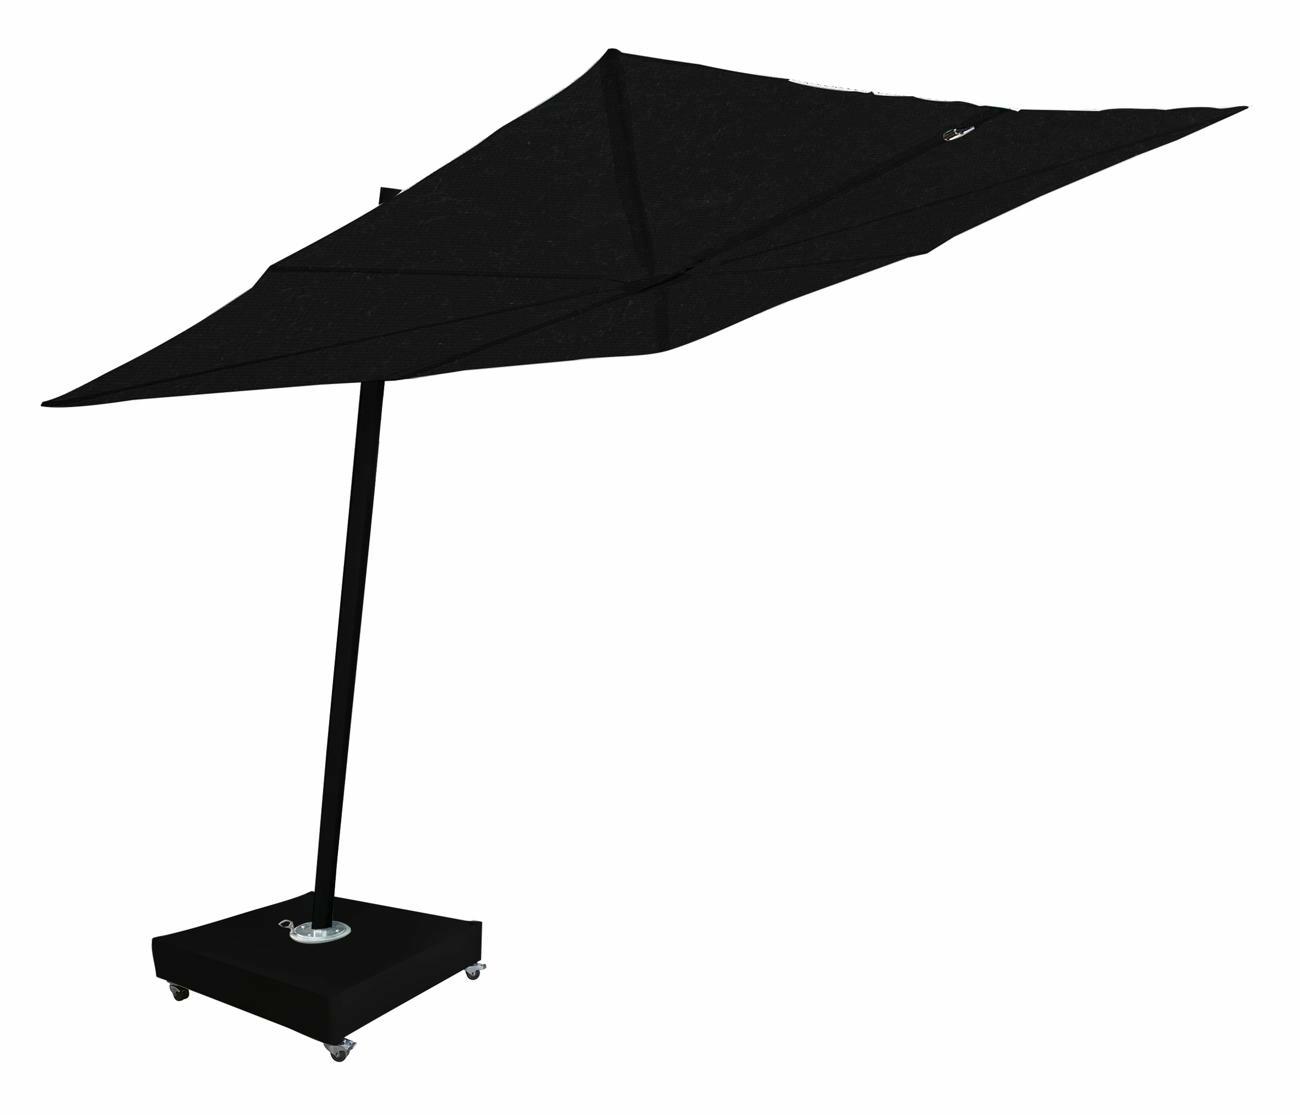 Spectra ombrellone a palo laterale avanti (80°)  ǀ struttura Dusk e base a crocera